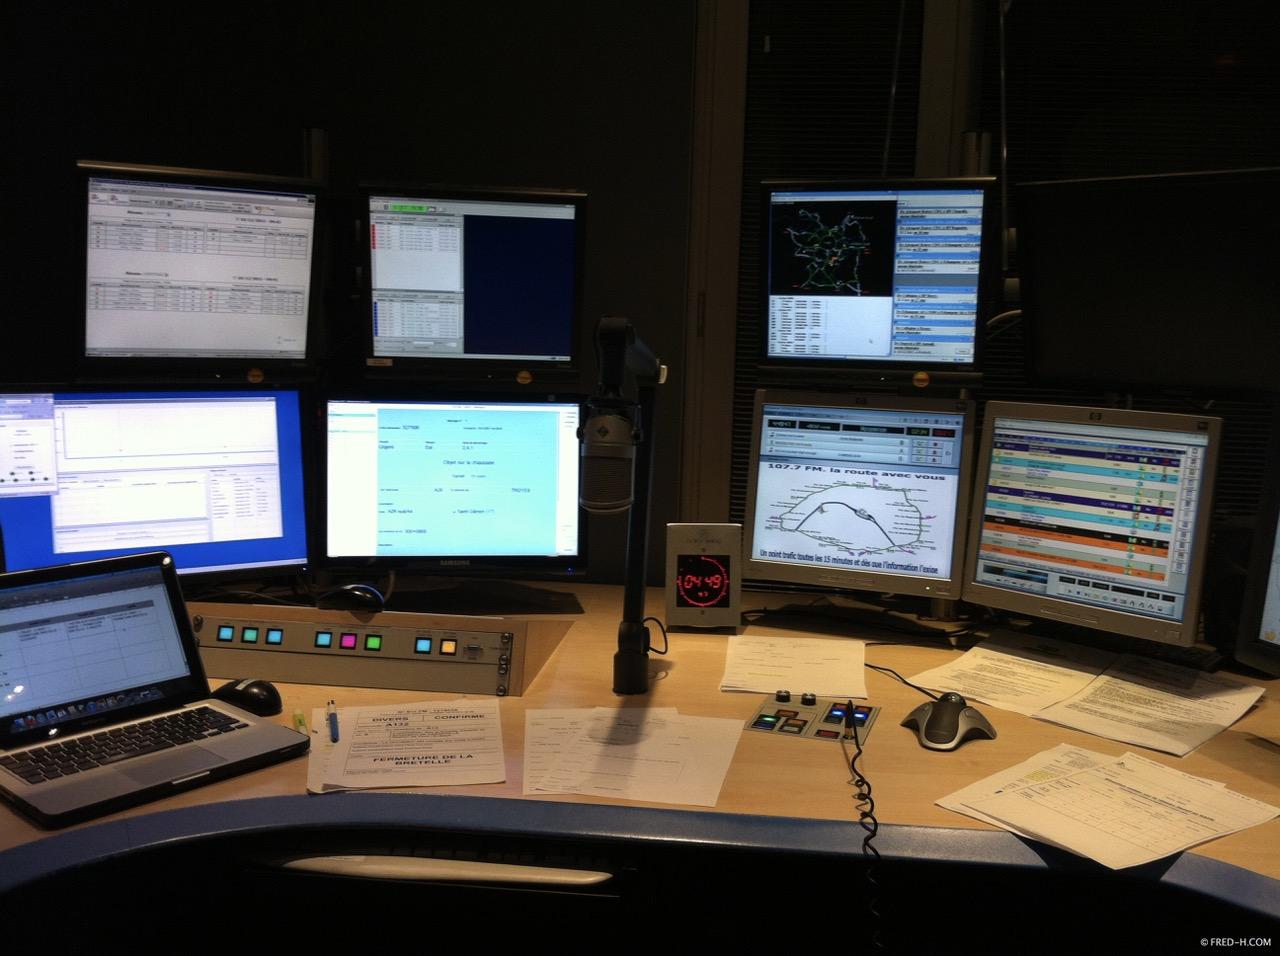 studios 107.7FM nuit senlis matériel radio